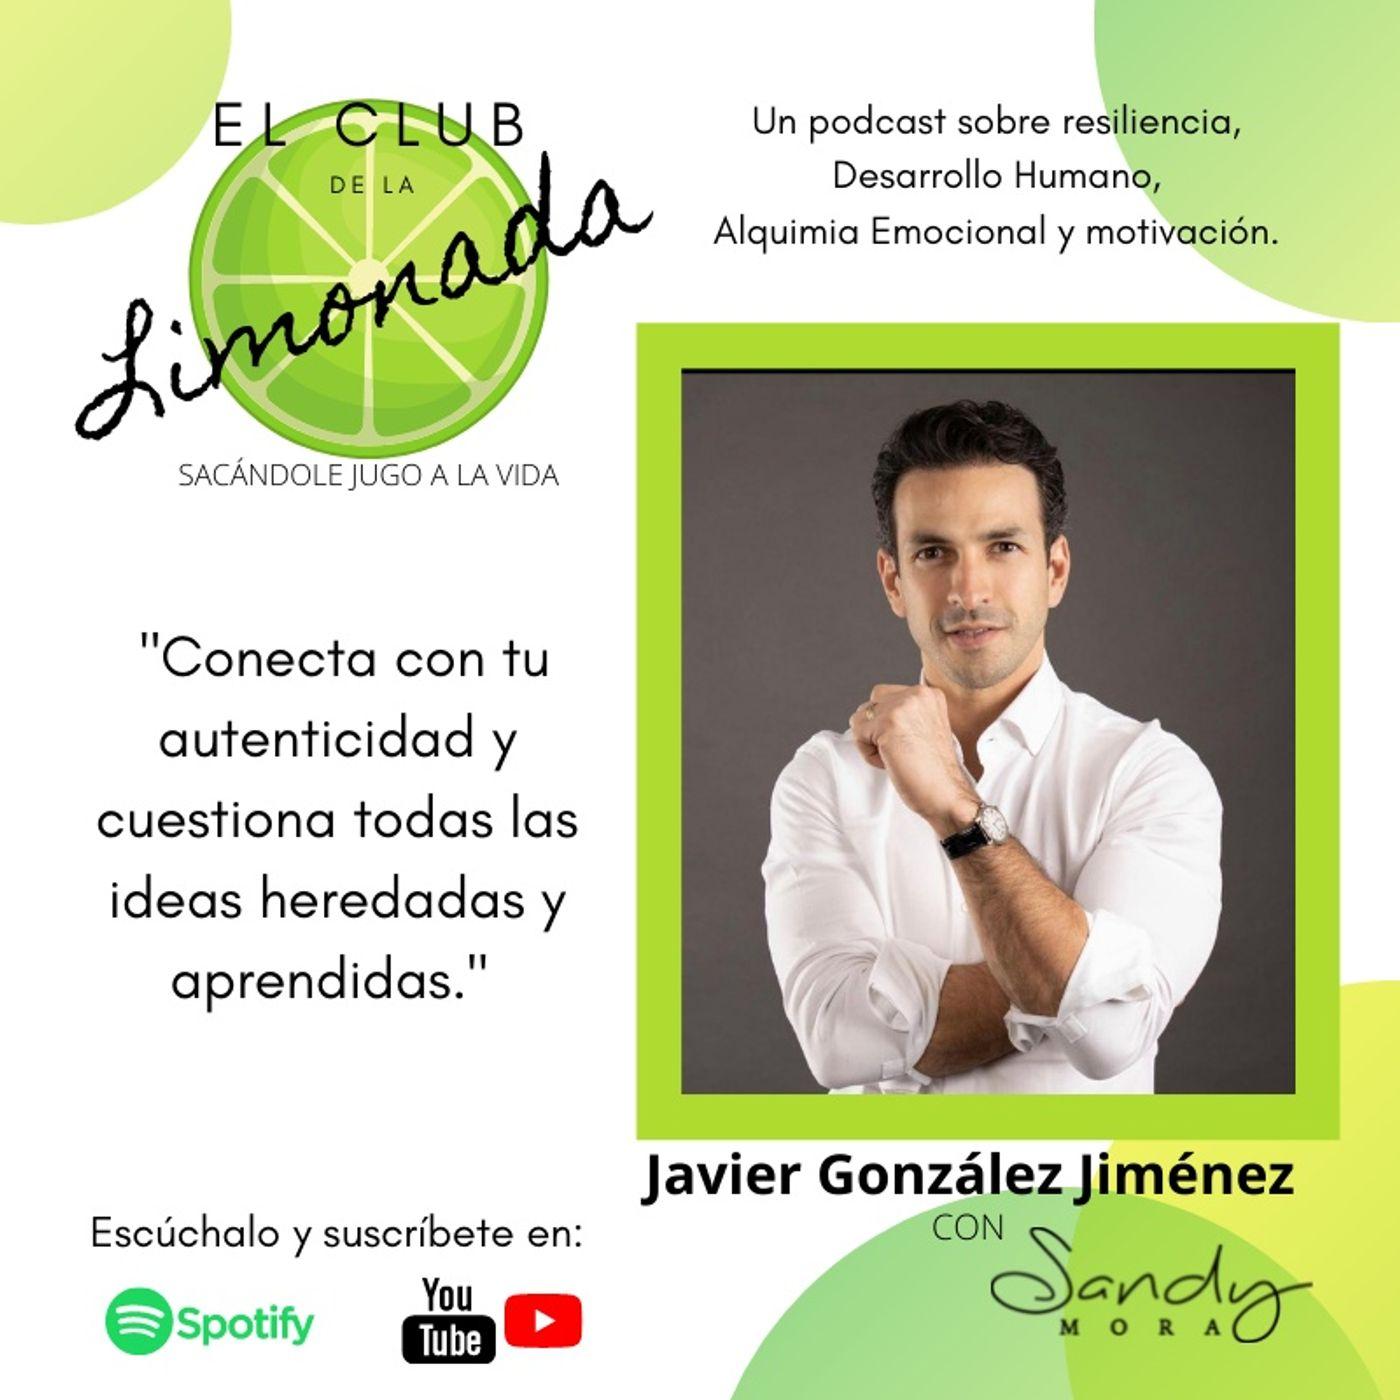 Episodio 58: Javier González Jiménez, el gran fraude del éxito.